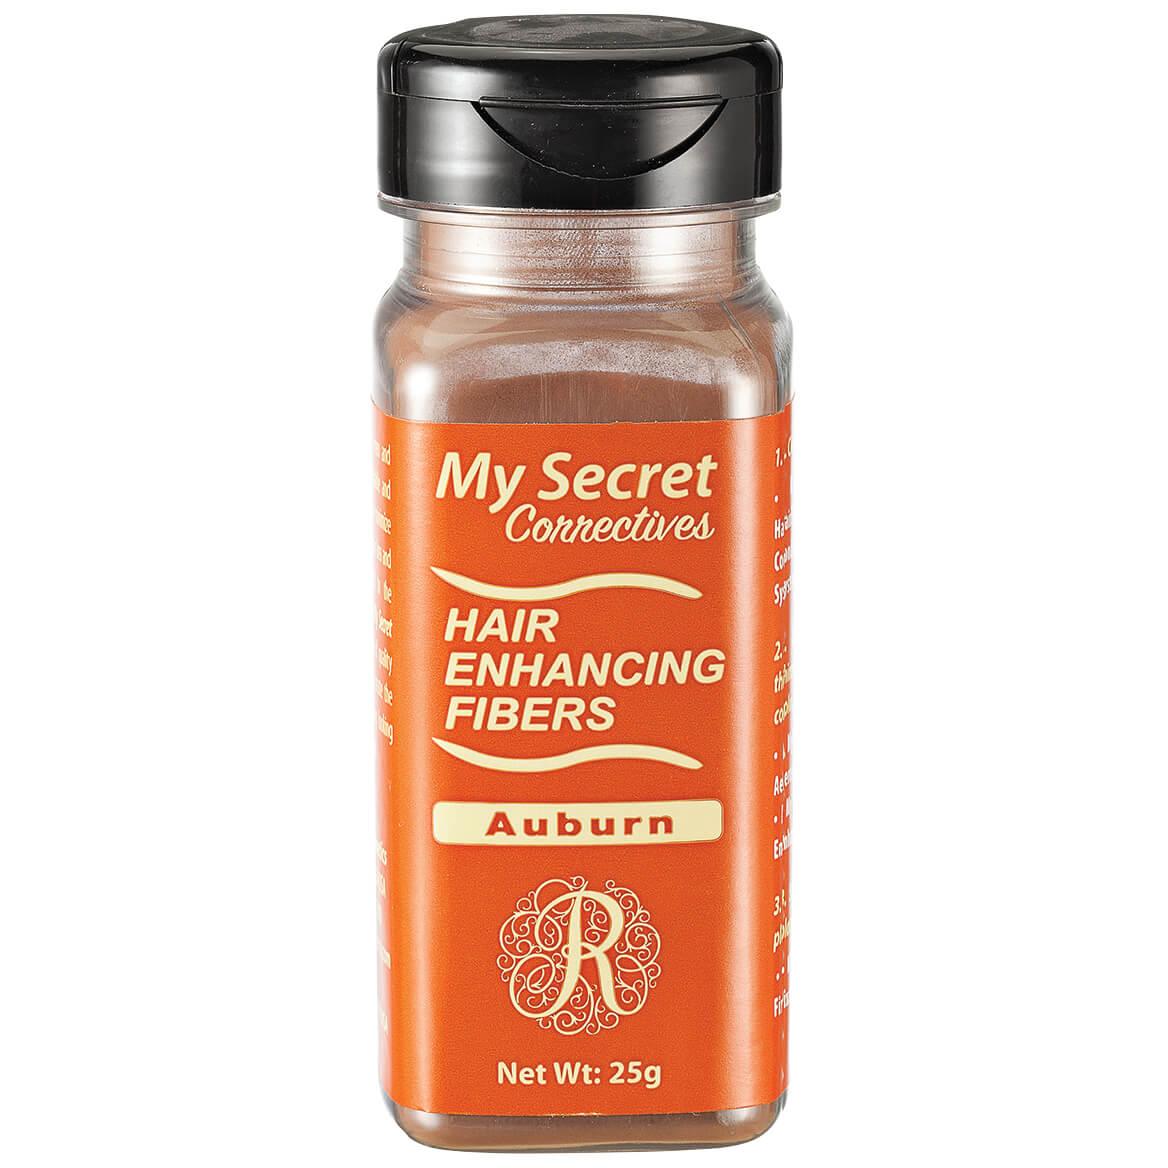 My Secret Correctives™ Hair Enhancing Fibers-367553